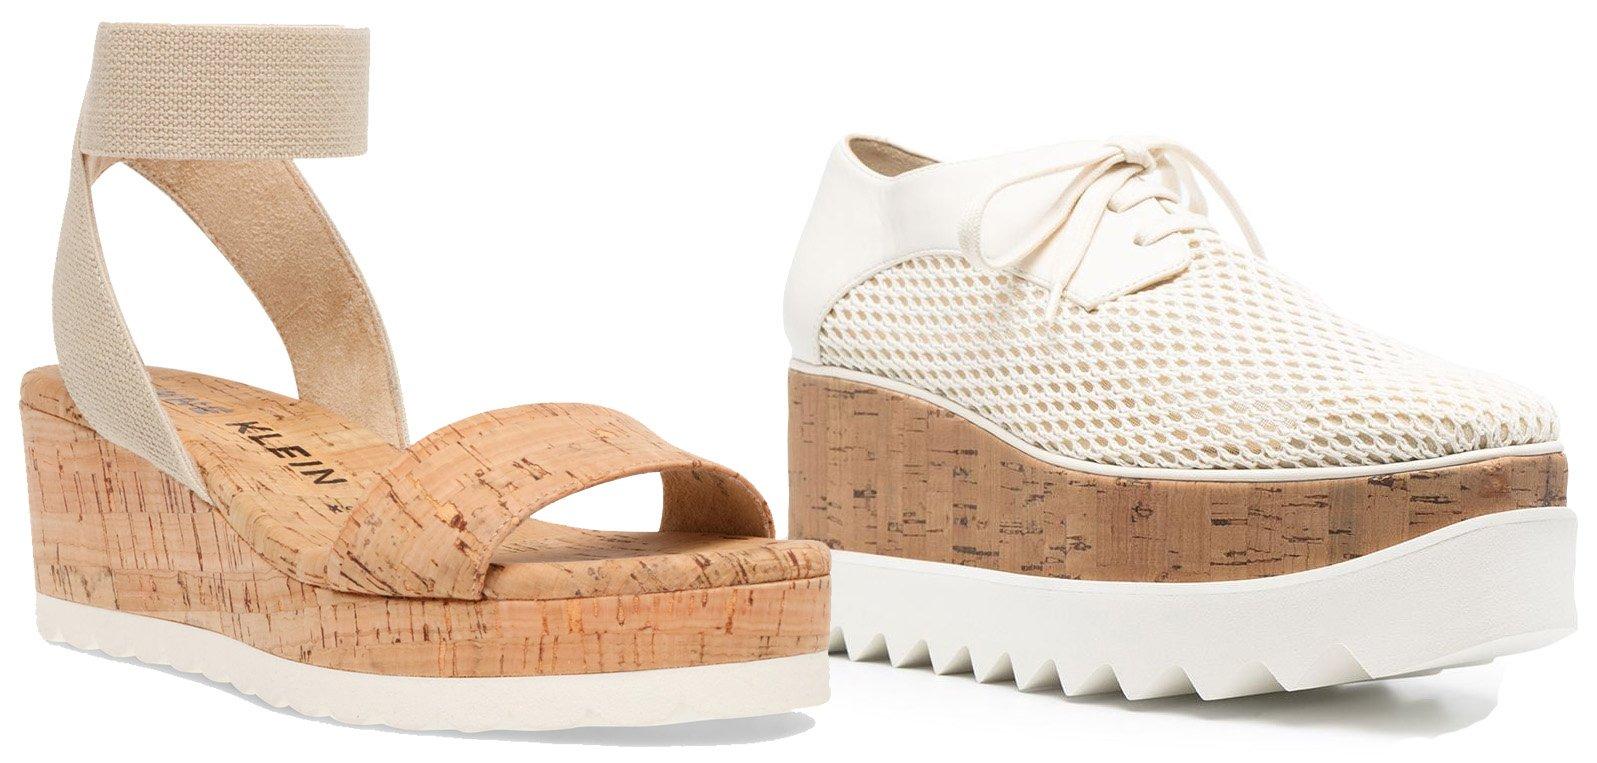 Anne Klein Noa Wedge Sandal, Stella McCartney Elyse platform lace-up shoes